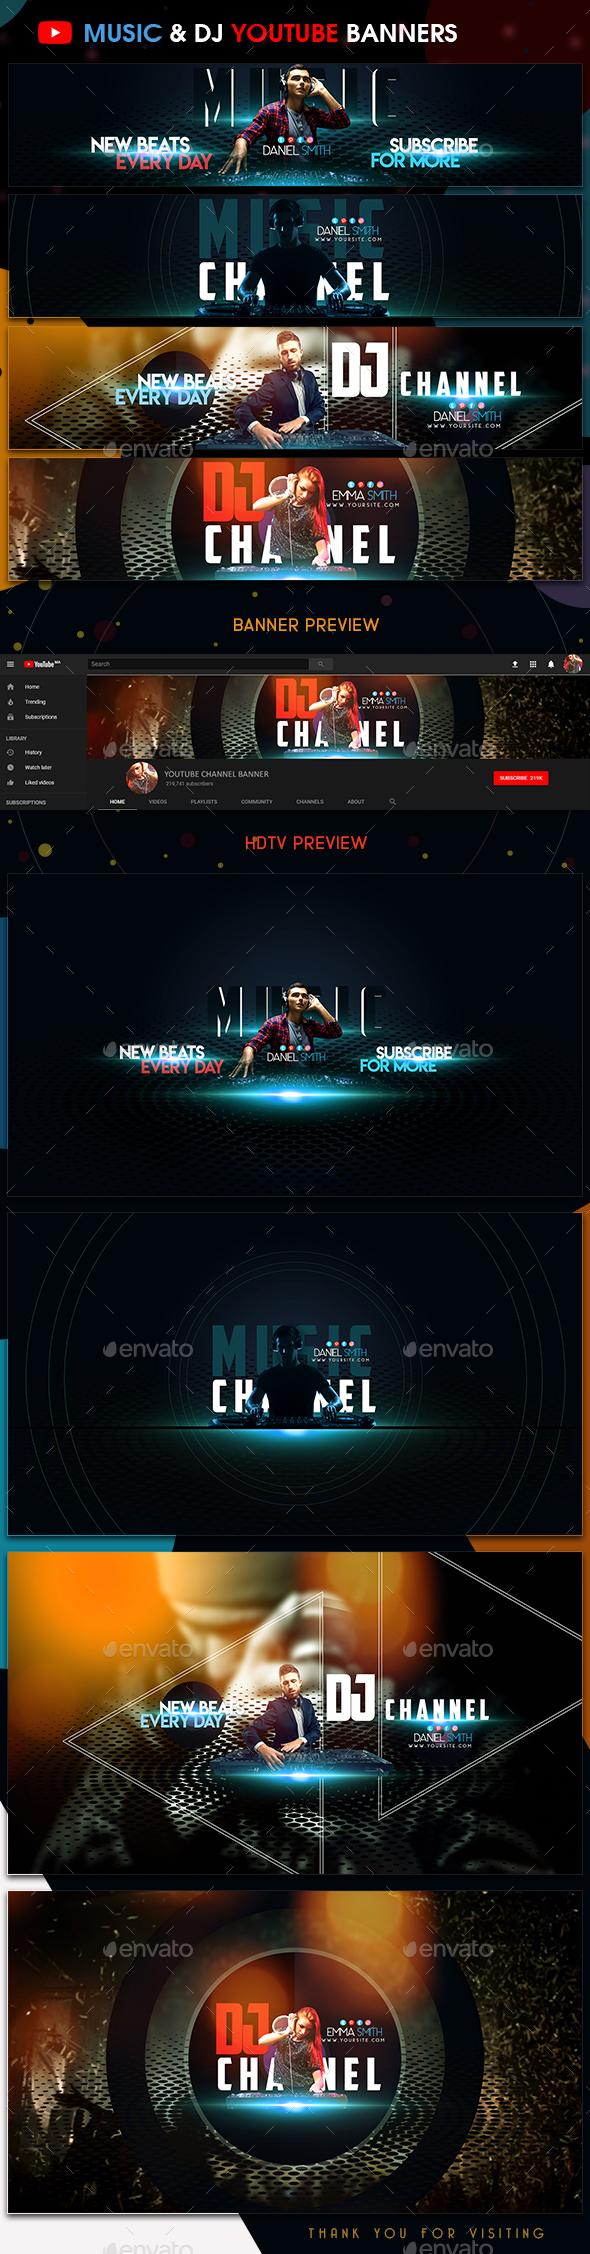 Music & DJ YouTube Banners - YouTube Social Media